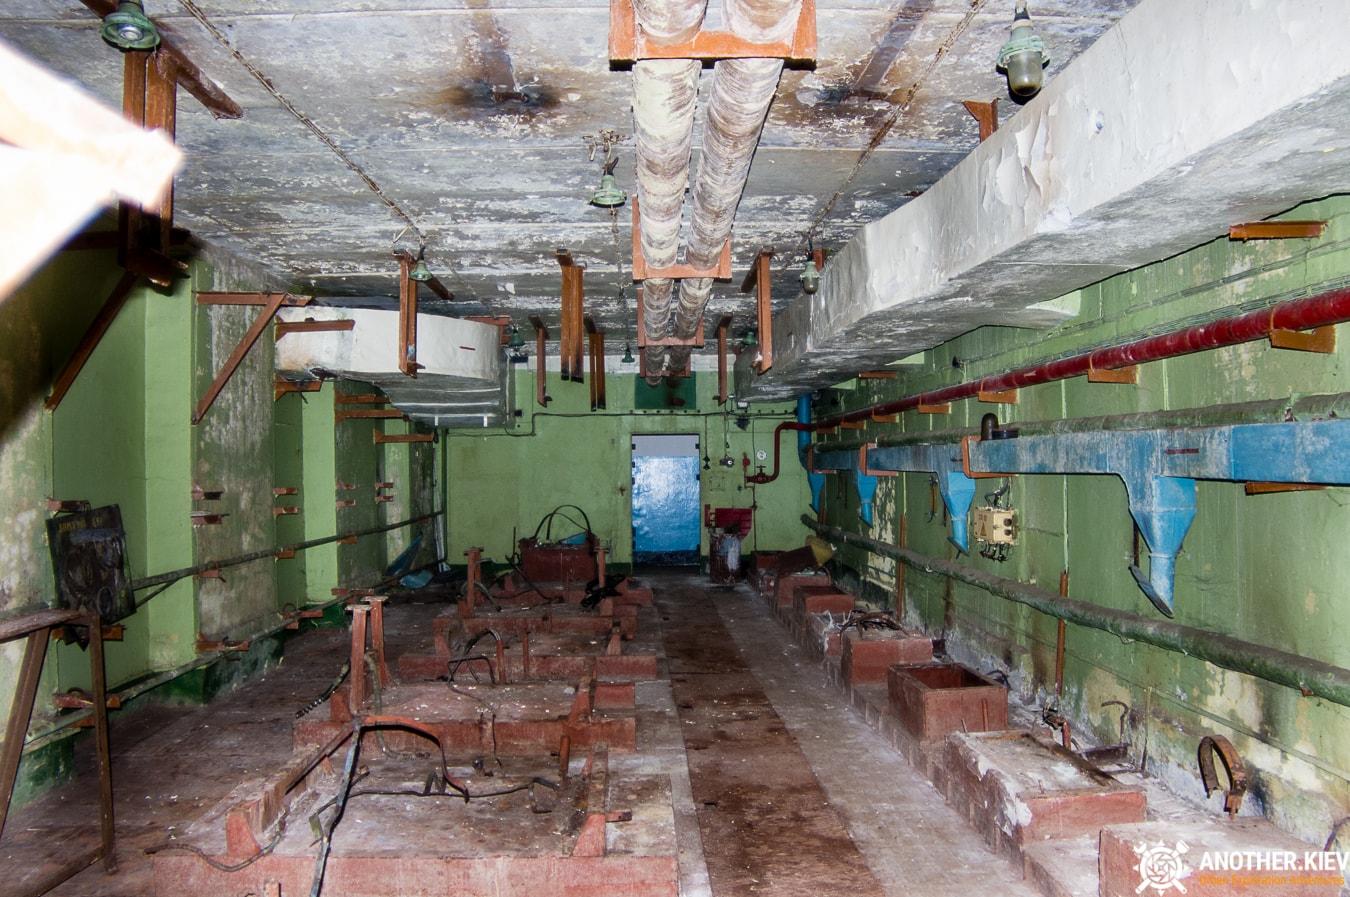 exploring-nuclear-bunker-duga-36 HIDDEN CHERNOBYL: EXPLORING NUCLEAR BUNKER  OF DUGA-3 RADAR STATION